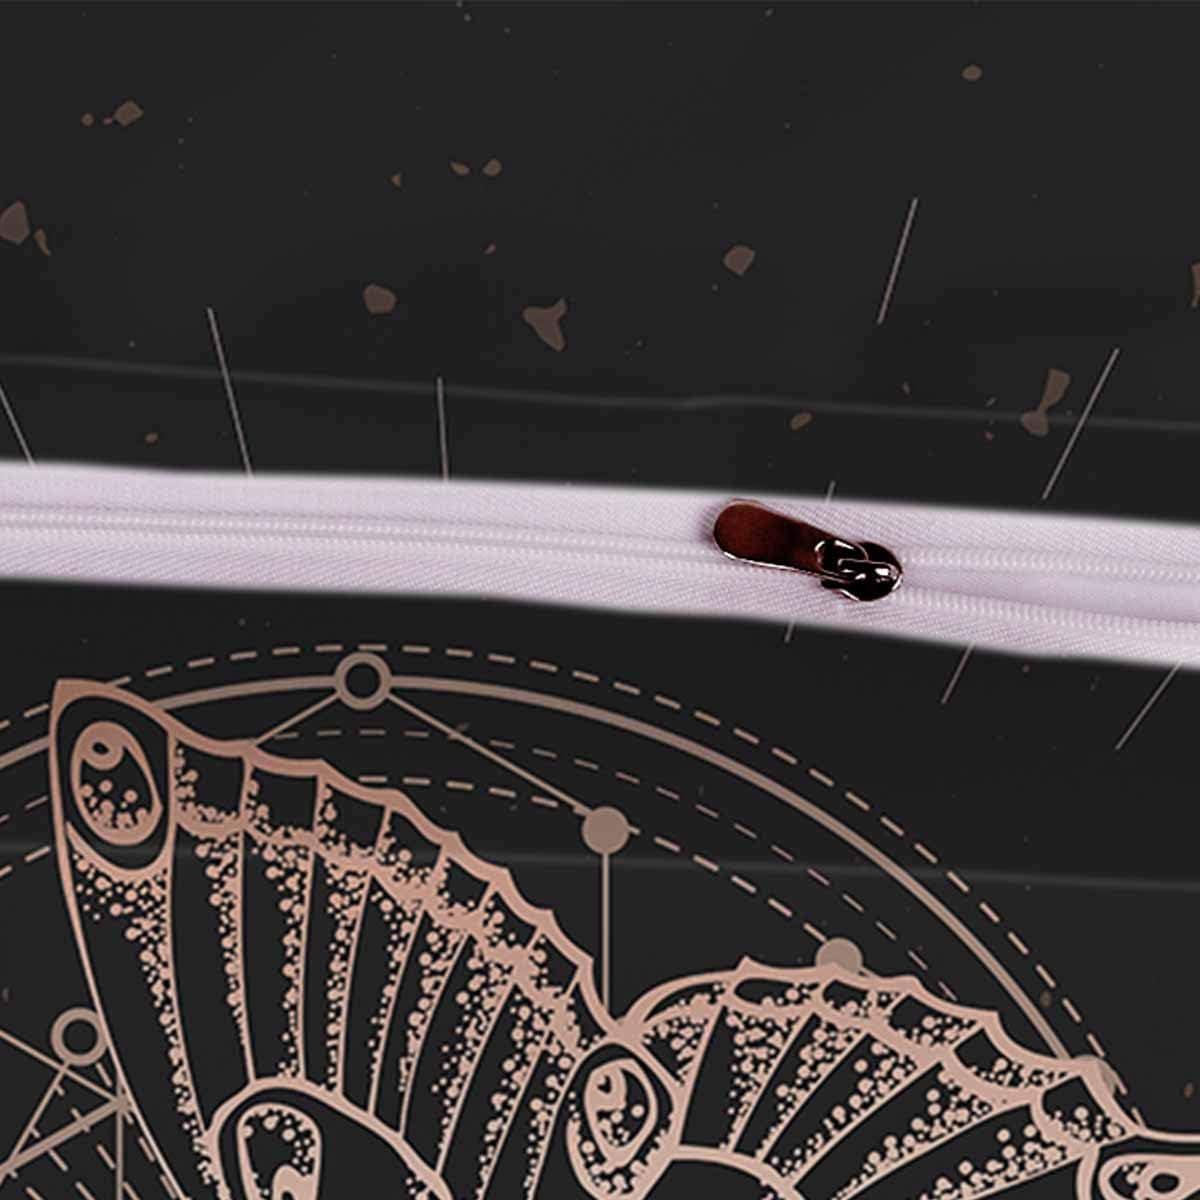 Loussiesd 3D Wild Animals Bedding Set King Size for Kids Boys Girls Teens Elk in The Forest D/écor Comforter Cover Set Soft Polyester Duvet Cover Set 3pcs with Zipper 1 Duvet Cover + 2 Pillowcases